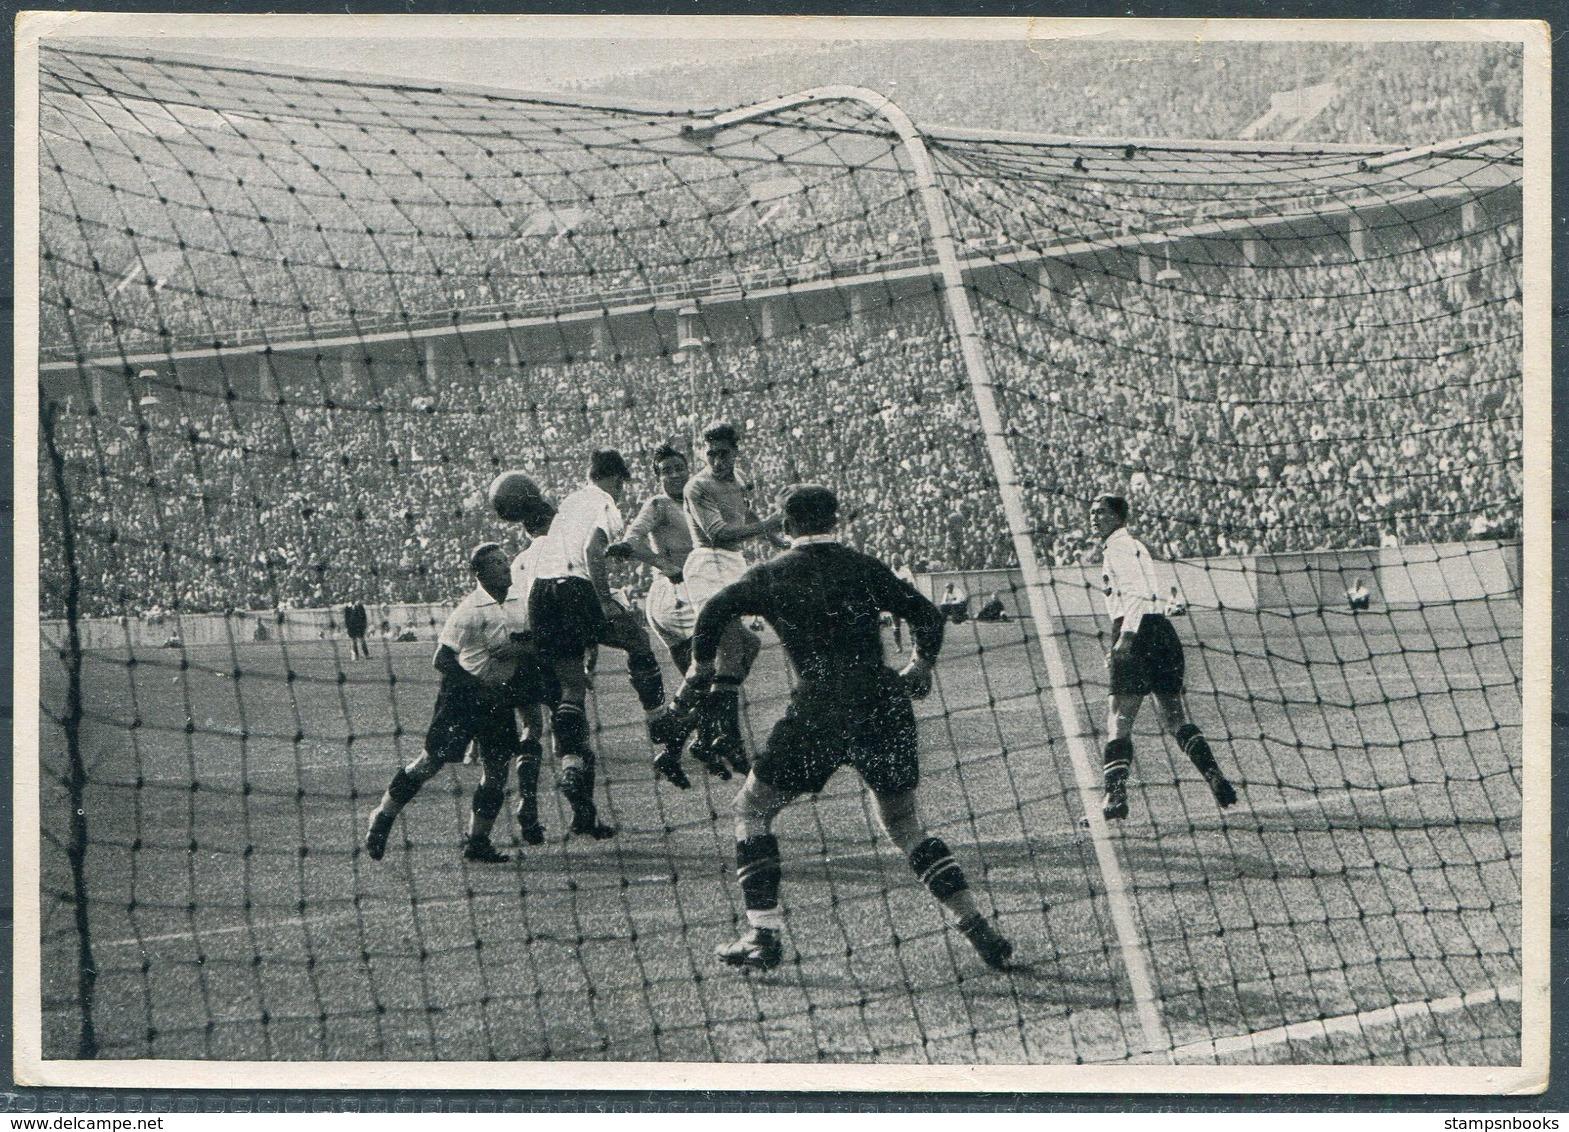 1936 Germany Berlin Olympics Olympia Sammelwerk 14 Bild 146 Gruppe 58 Italy V Austria Football - Trading Cards